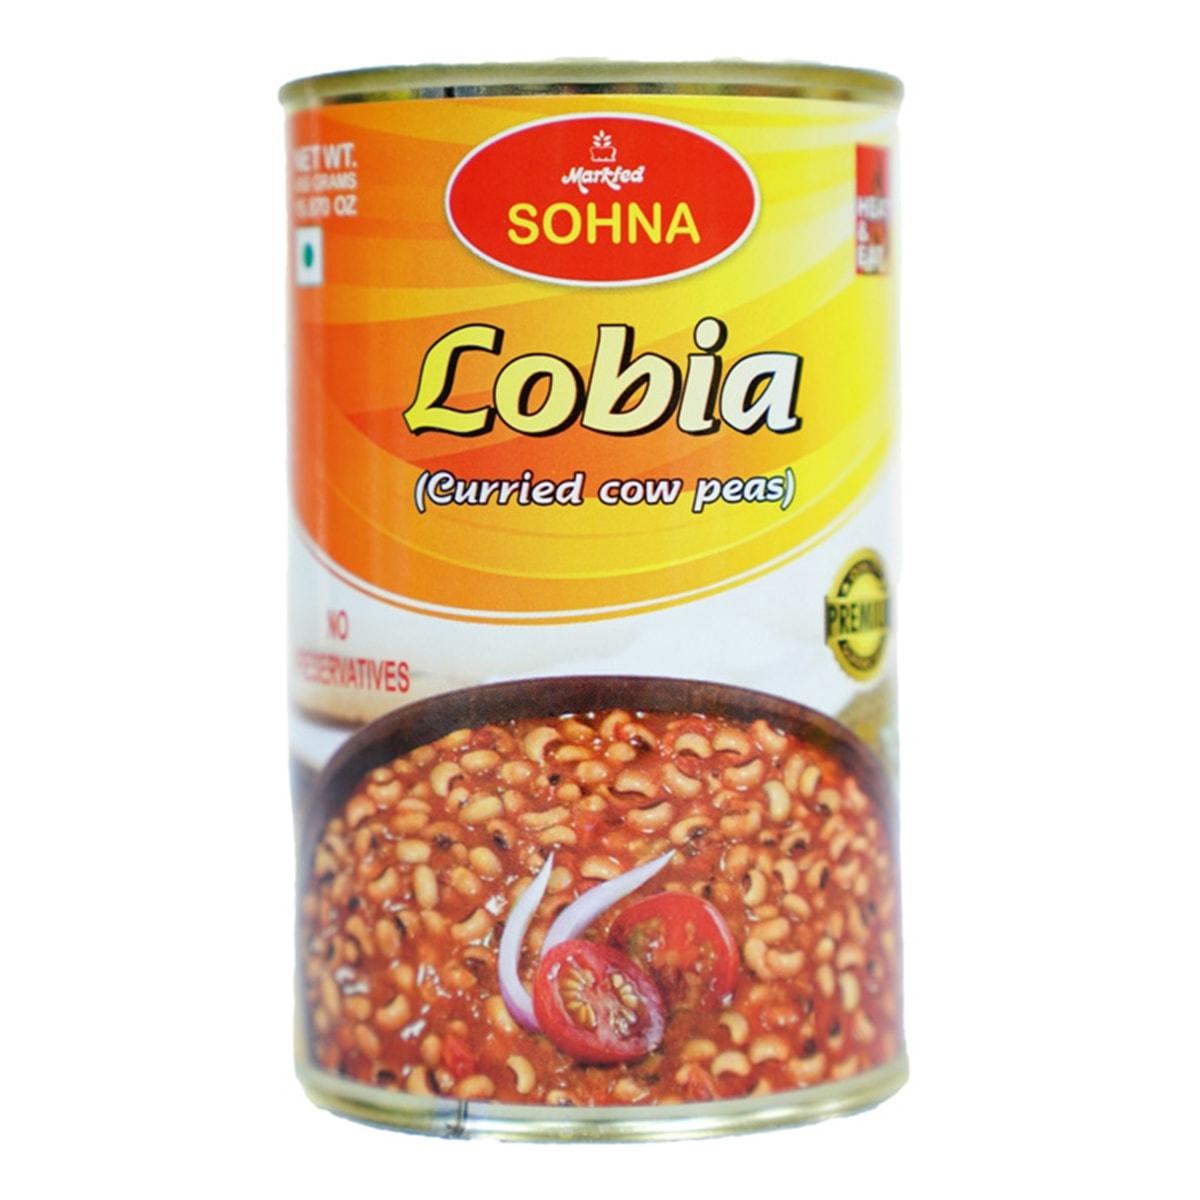 Buy Markfed Sohna Lobia (Cow Peas Curried) - 450 gm